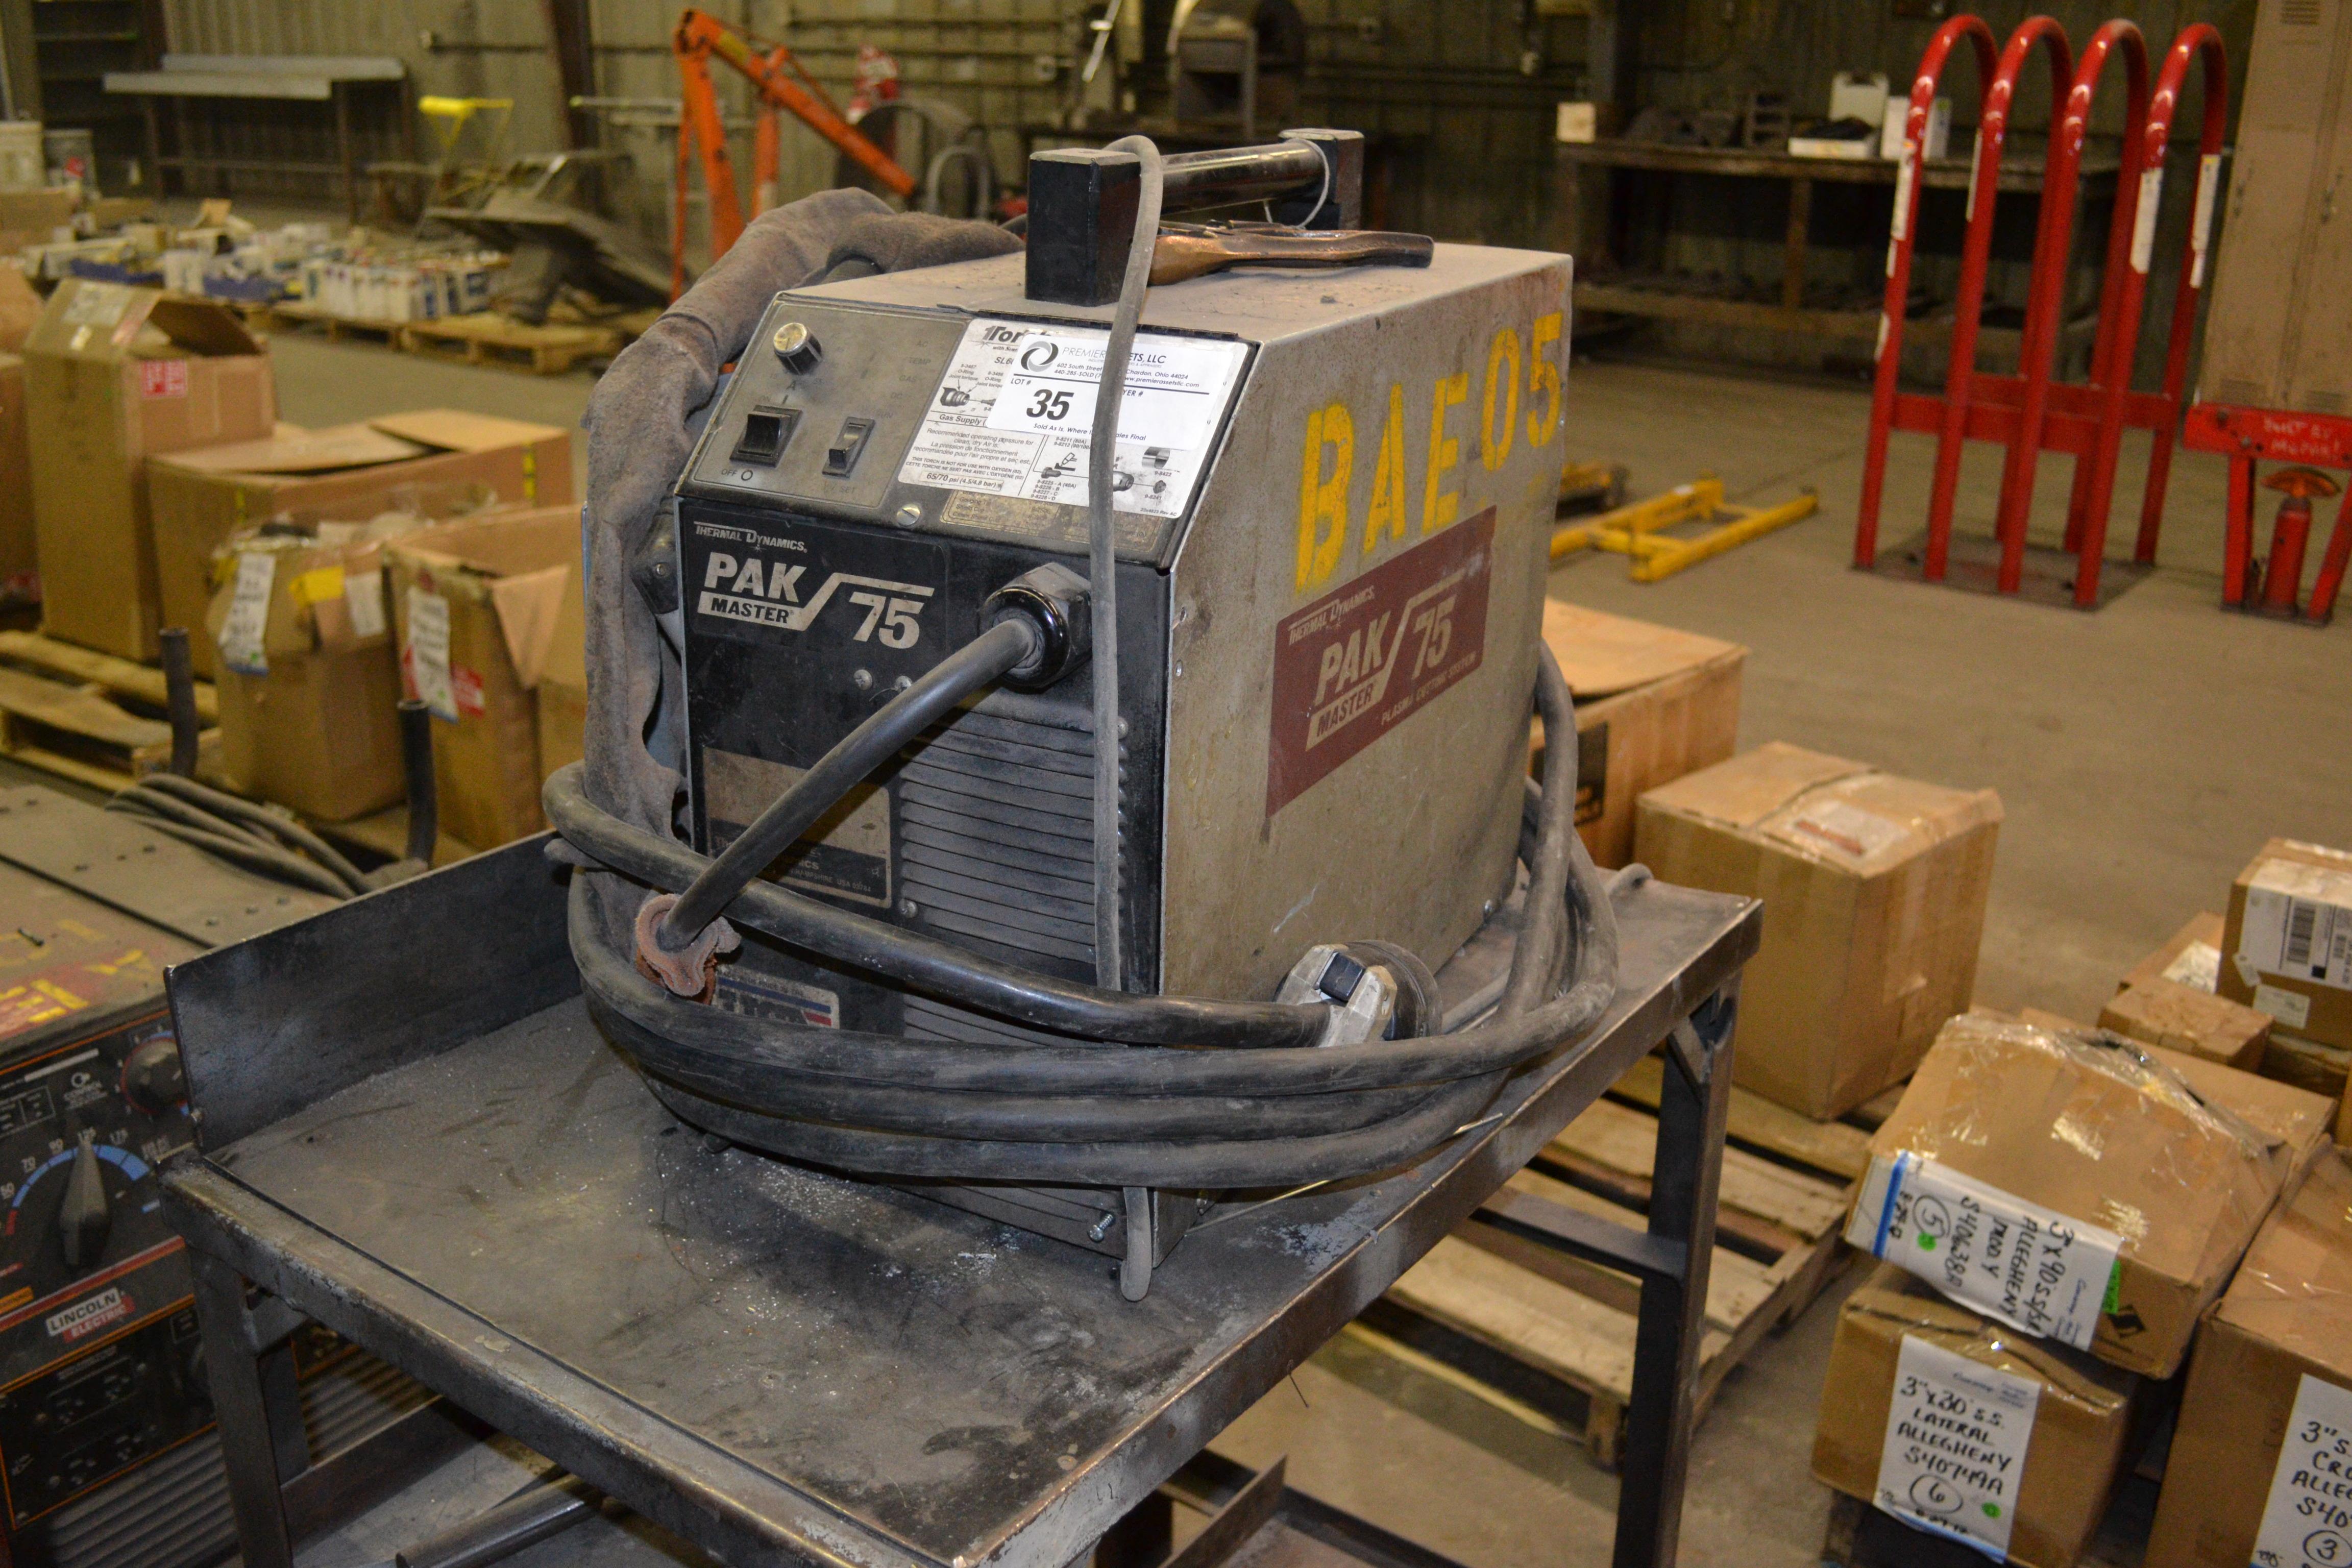 Lot 35 - Thermal Dynamics PAK Master 75 plasma cutter